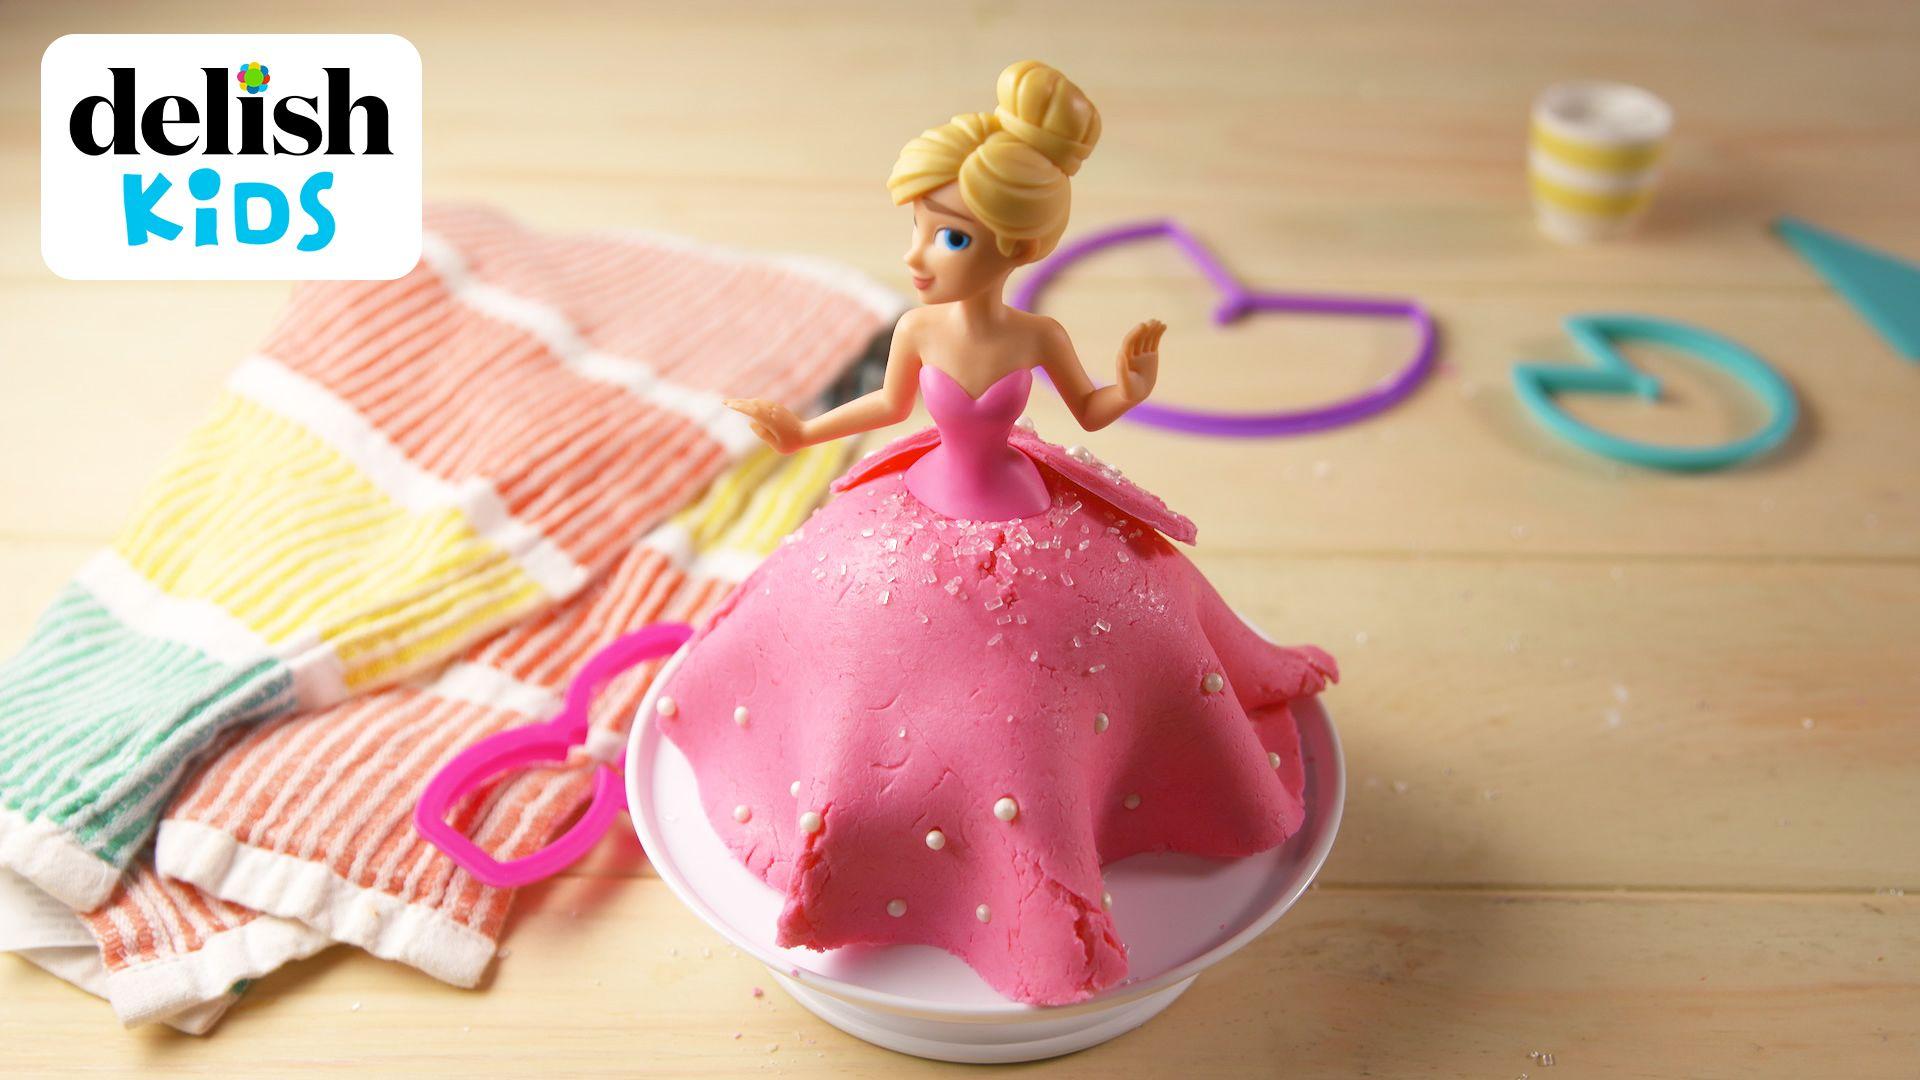 This Adorable Kit Lets Kids Make Their Own Princess Cakes